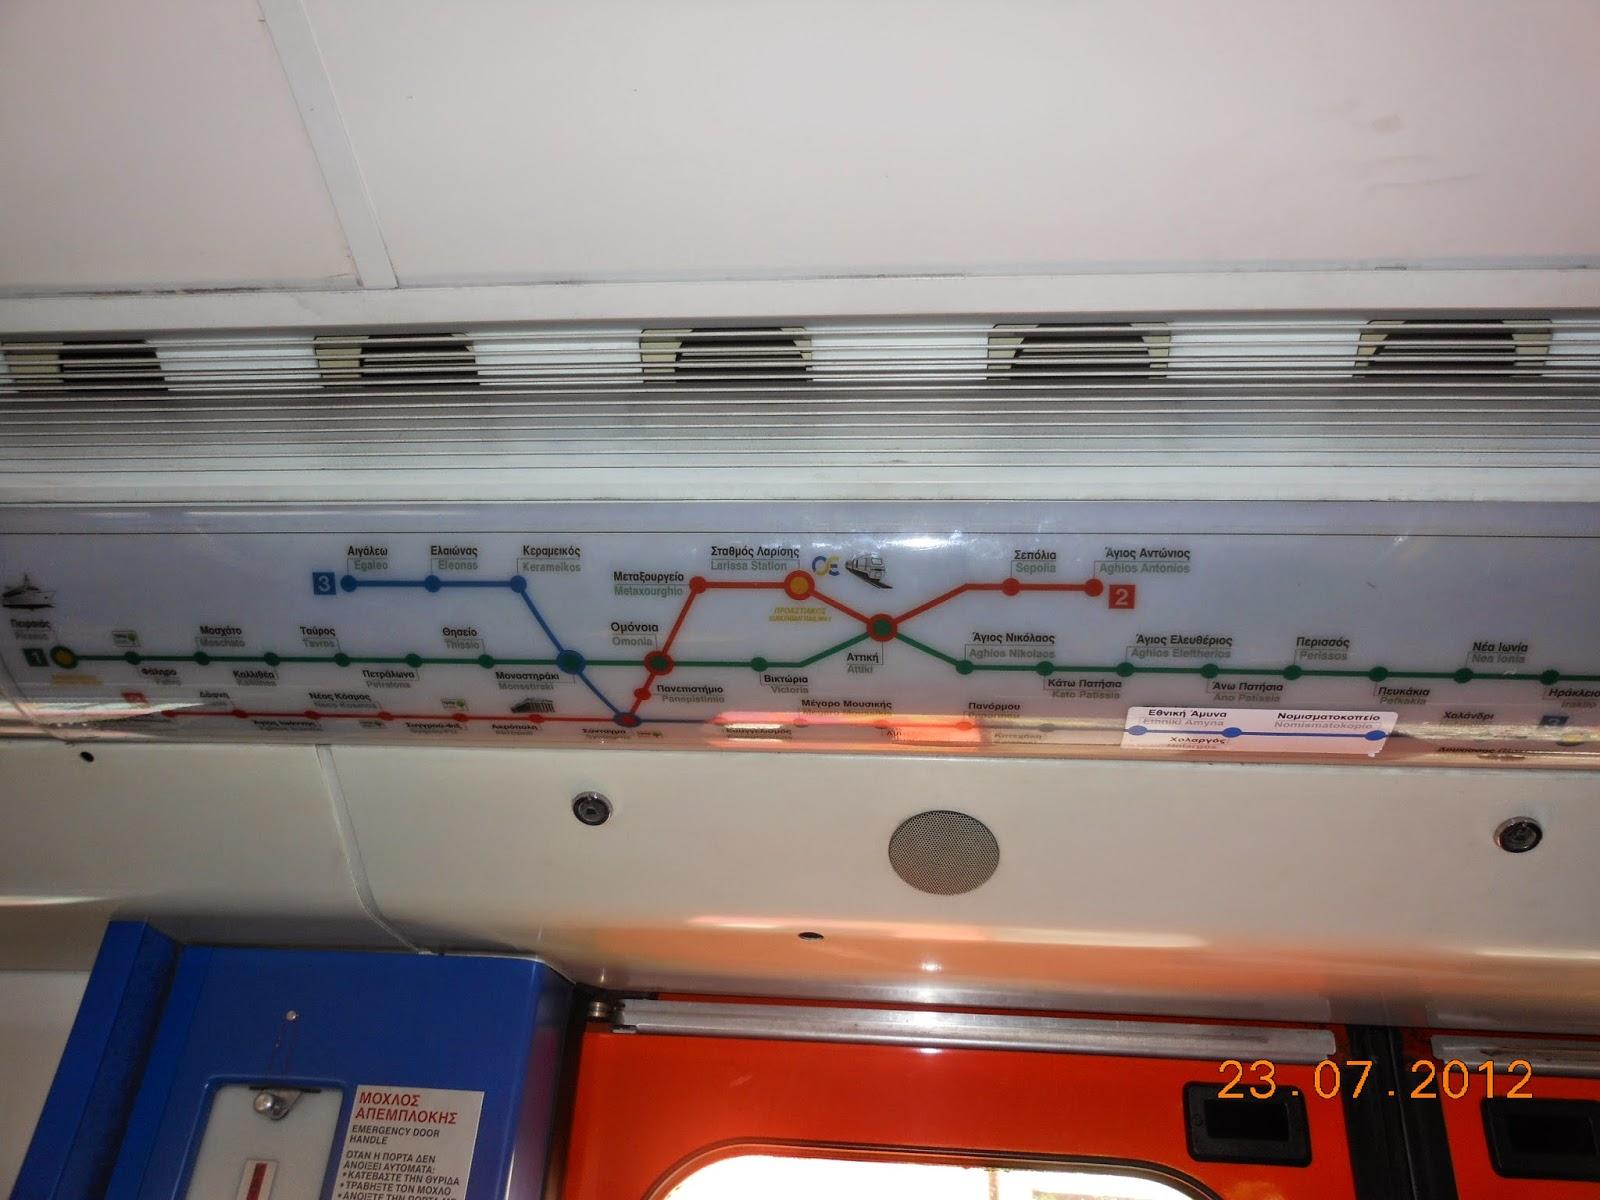 Metrô de Atenas - Grécia